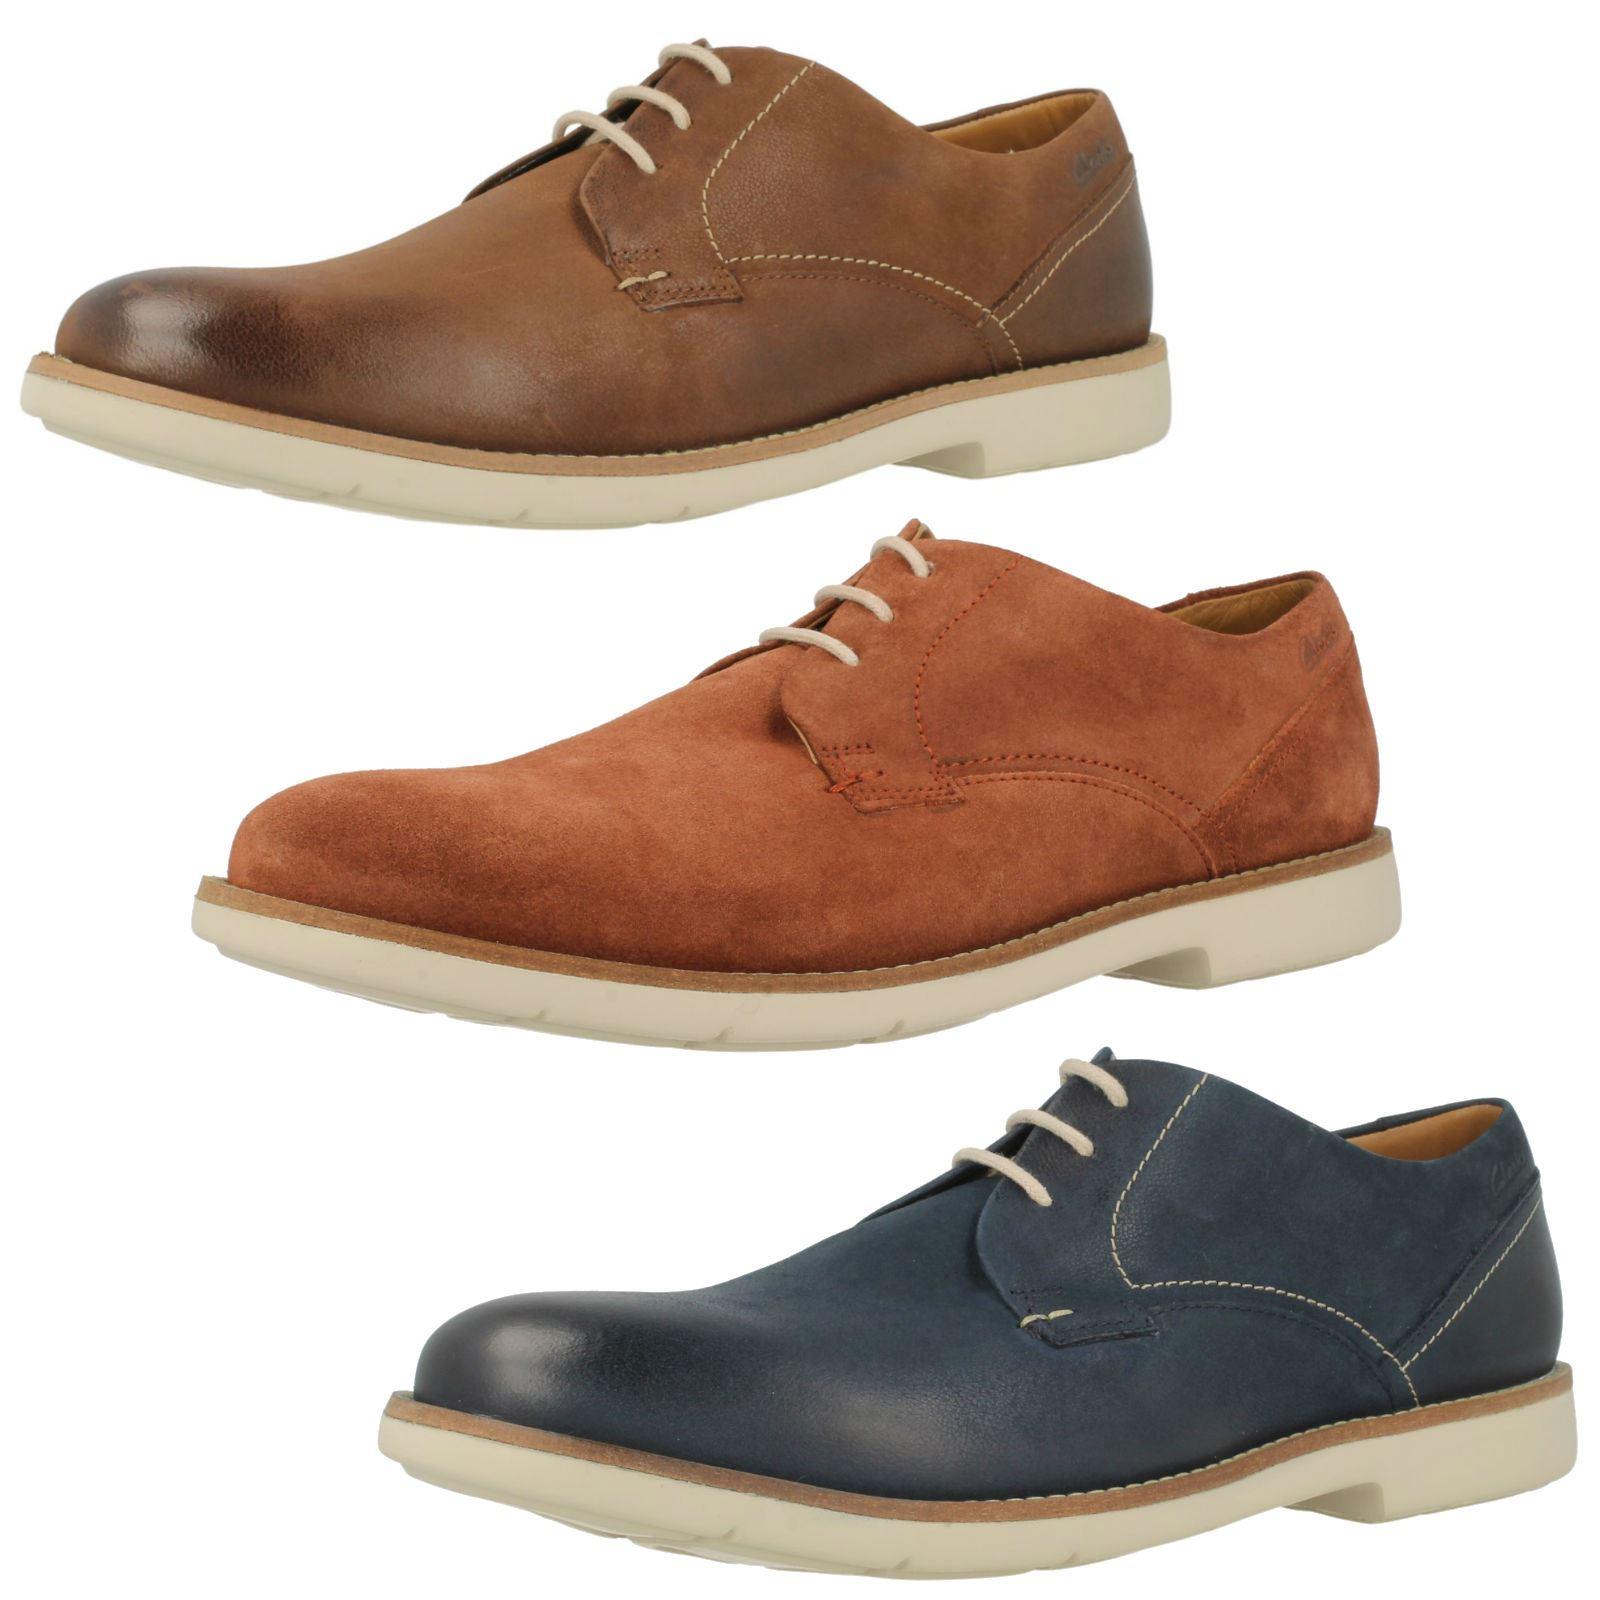 Ebay Childrens Clarks Shoes